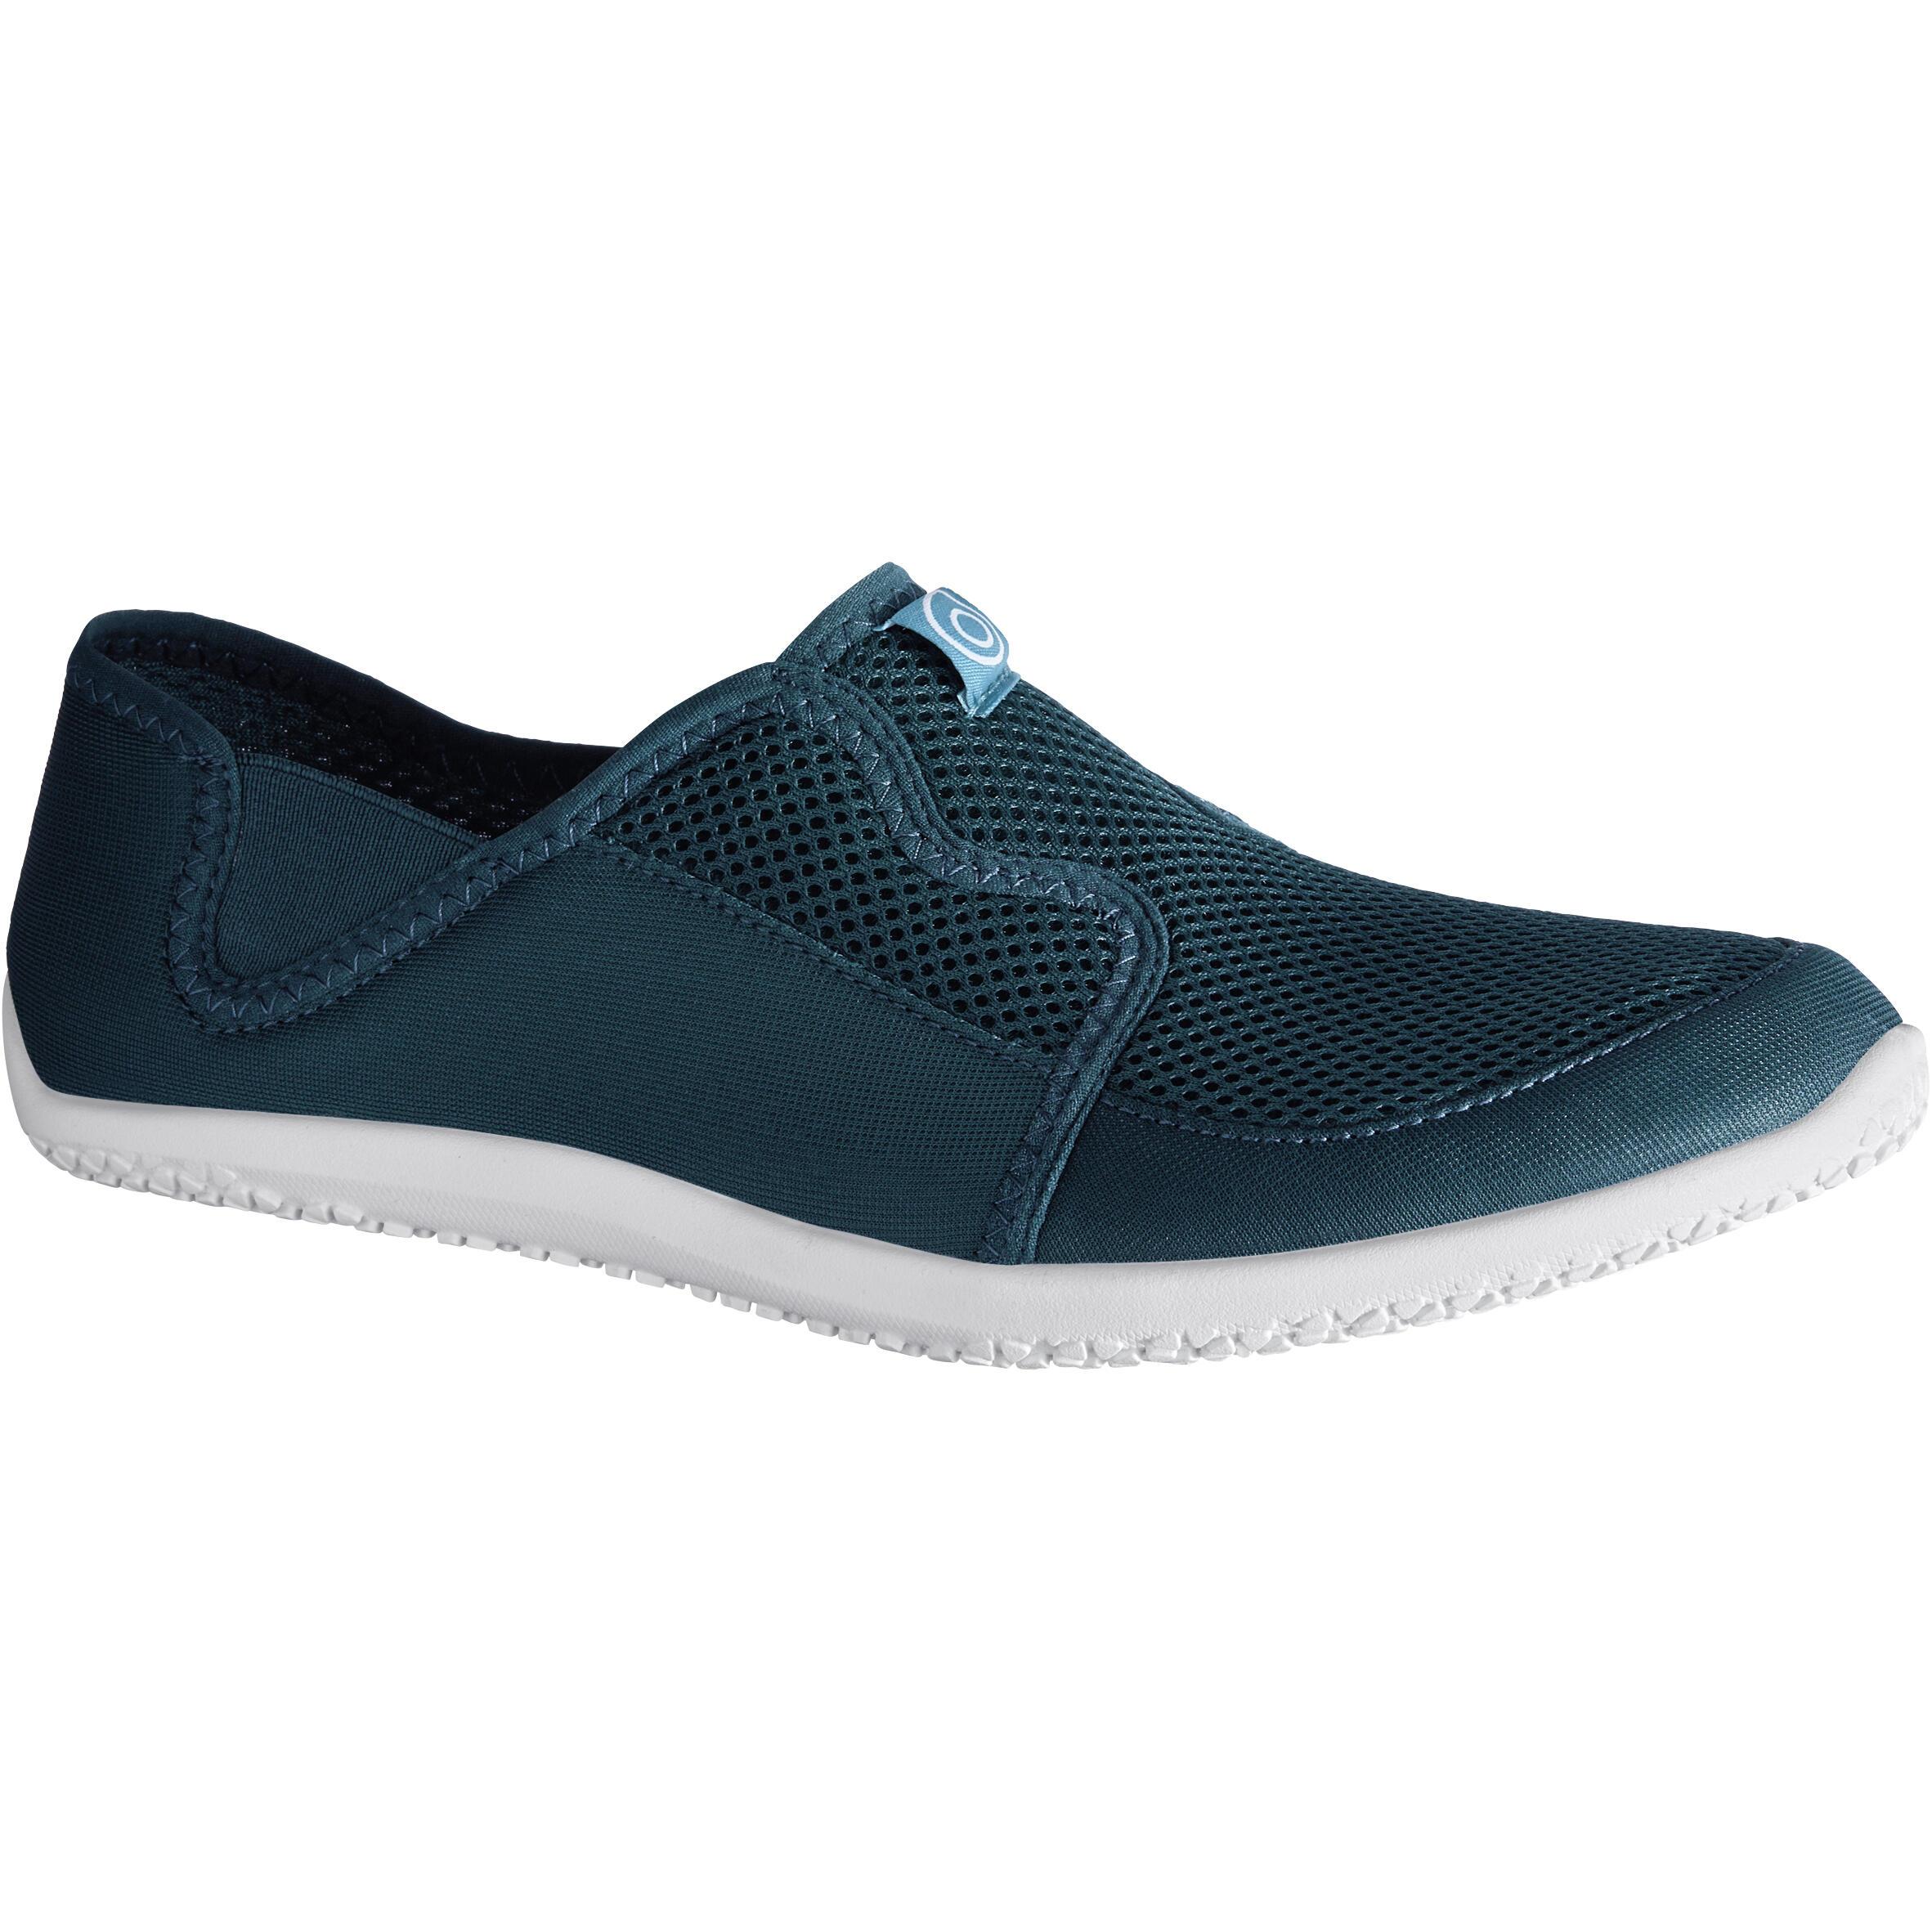 Aquaschuhe 120 Erwachsene dunkeltürkis   Schuhe > Badeschuhe   Blau - Türkis   Subea